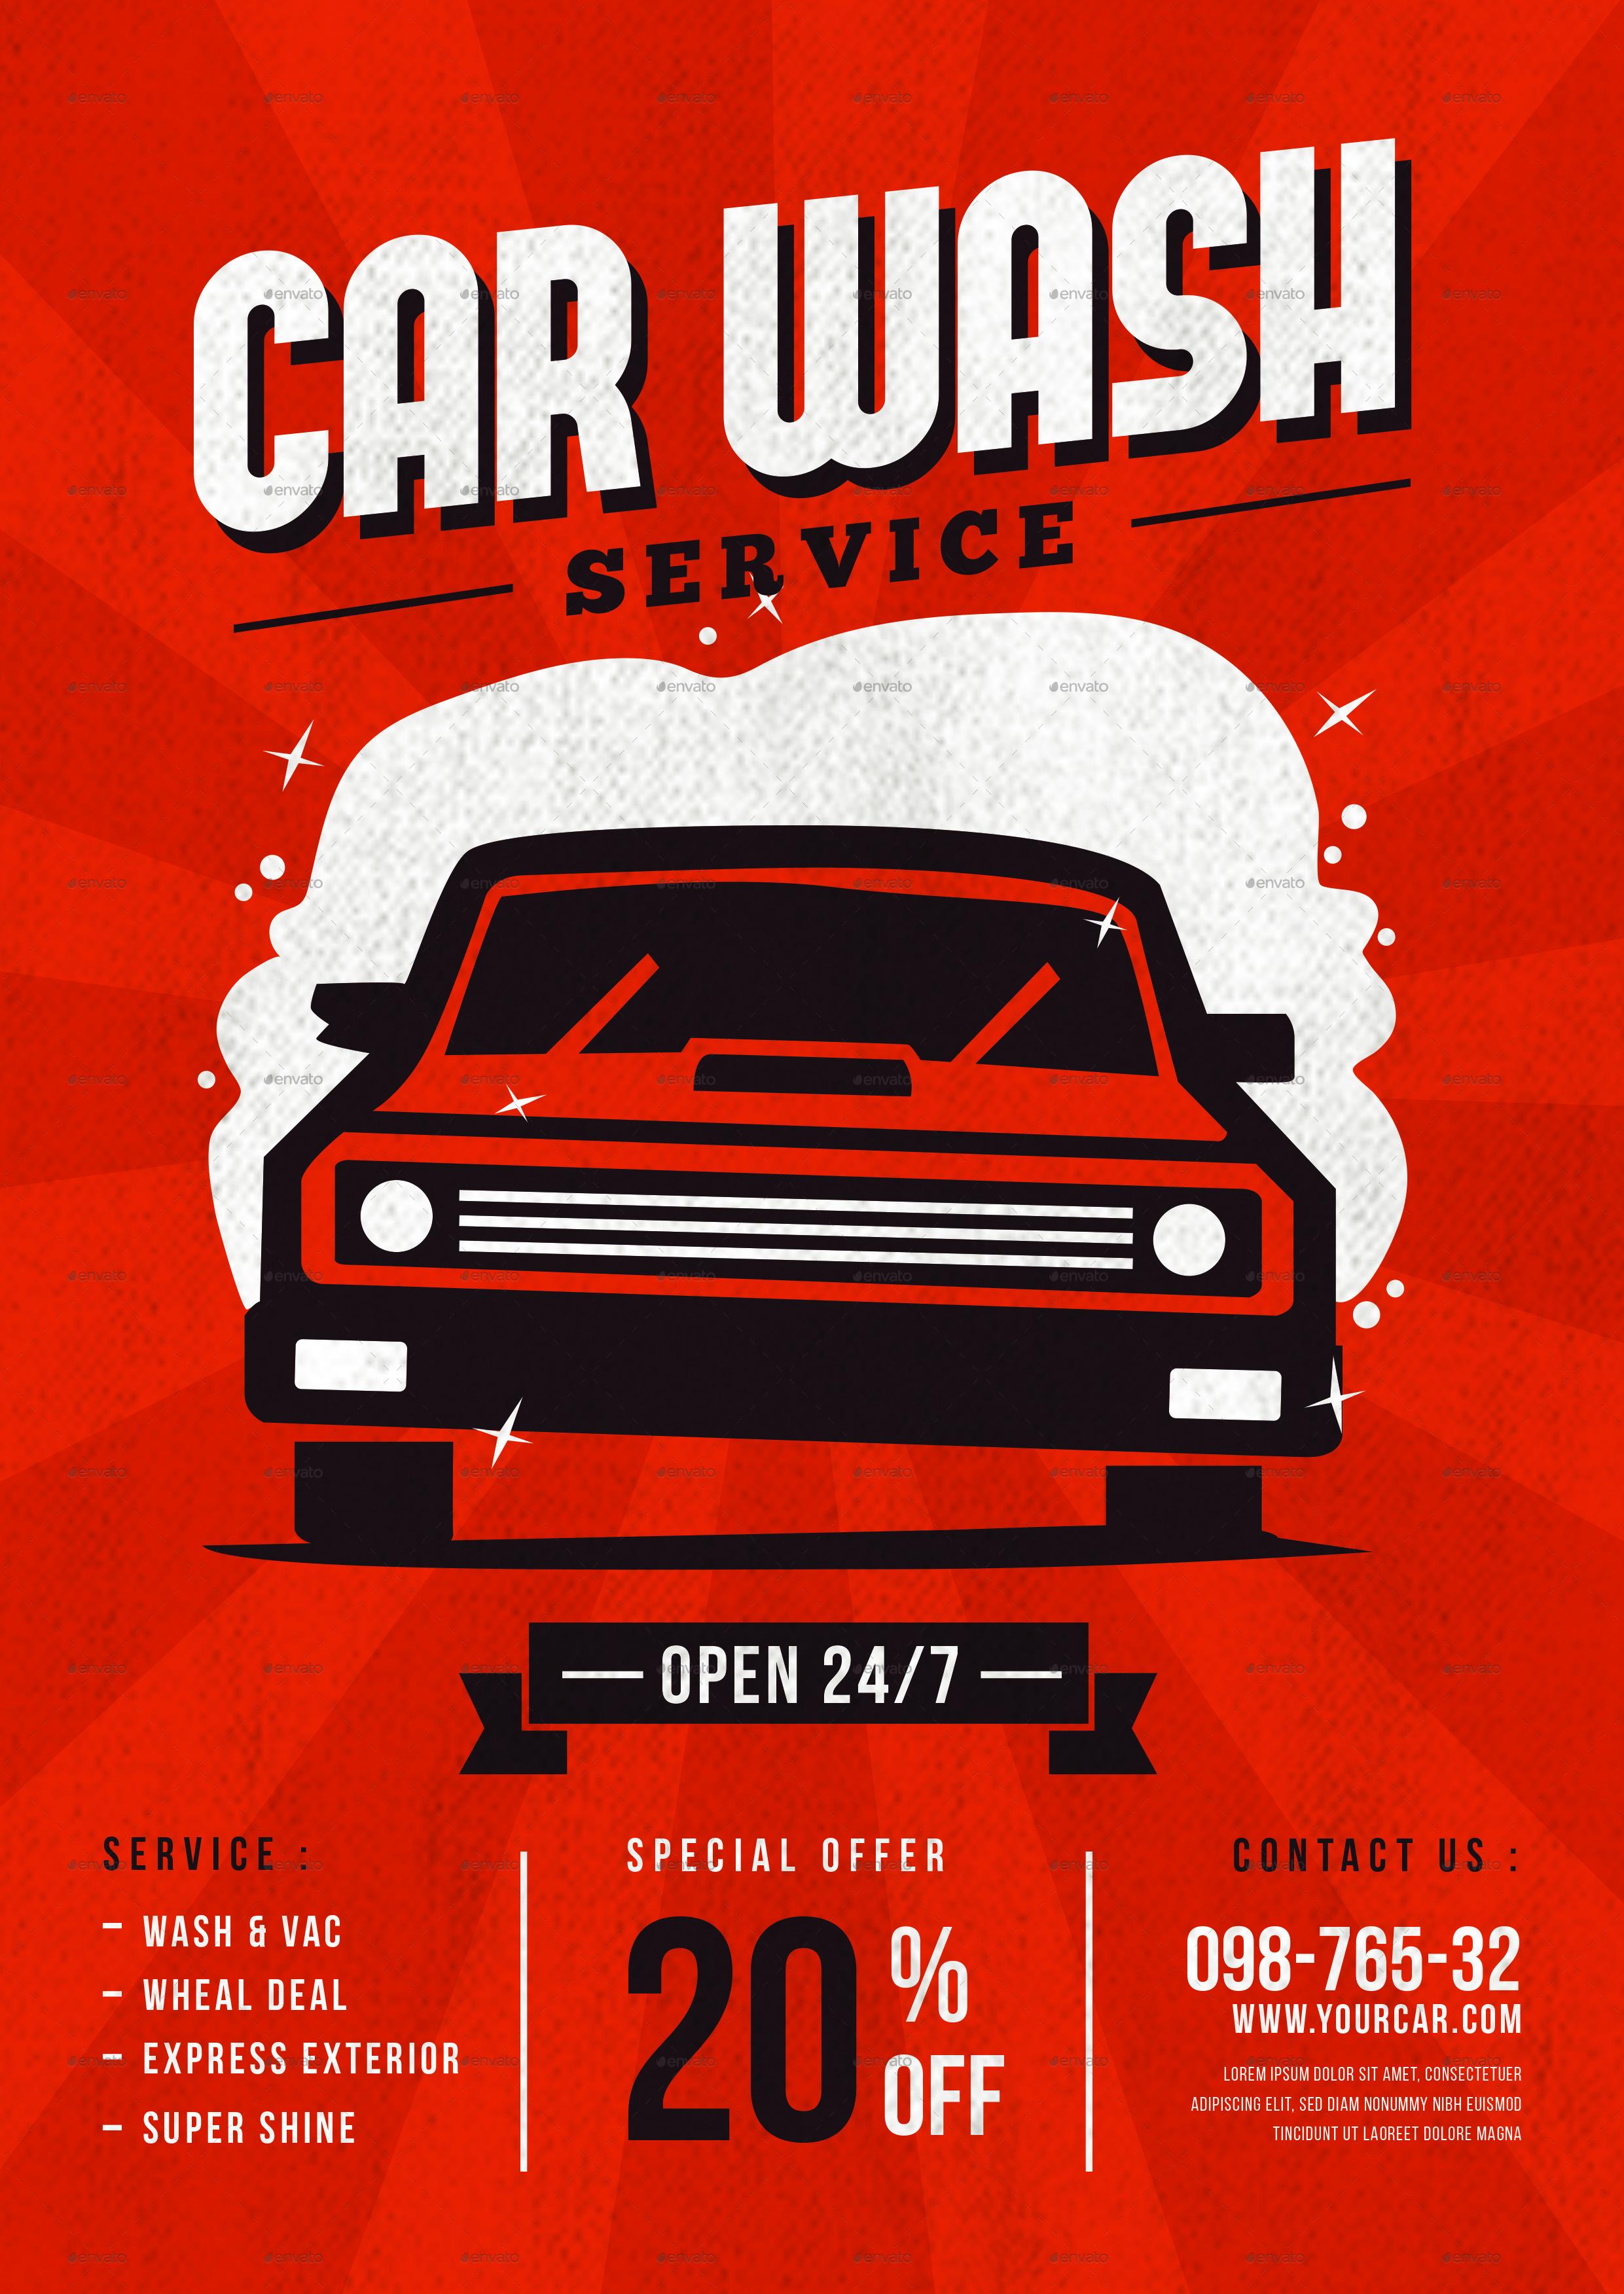 car wash service flyer by tokosatsu graphicriver preview image set car wash flyer 1 jpg